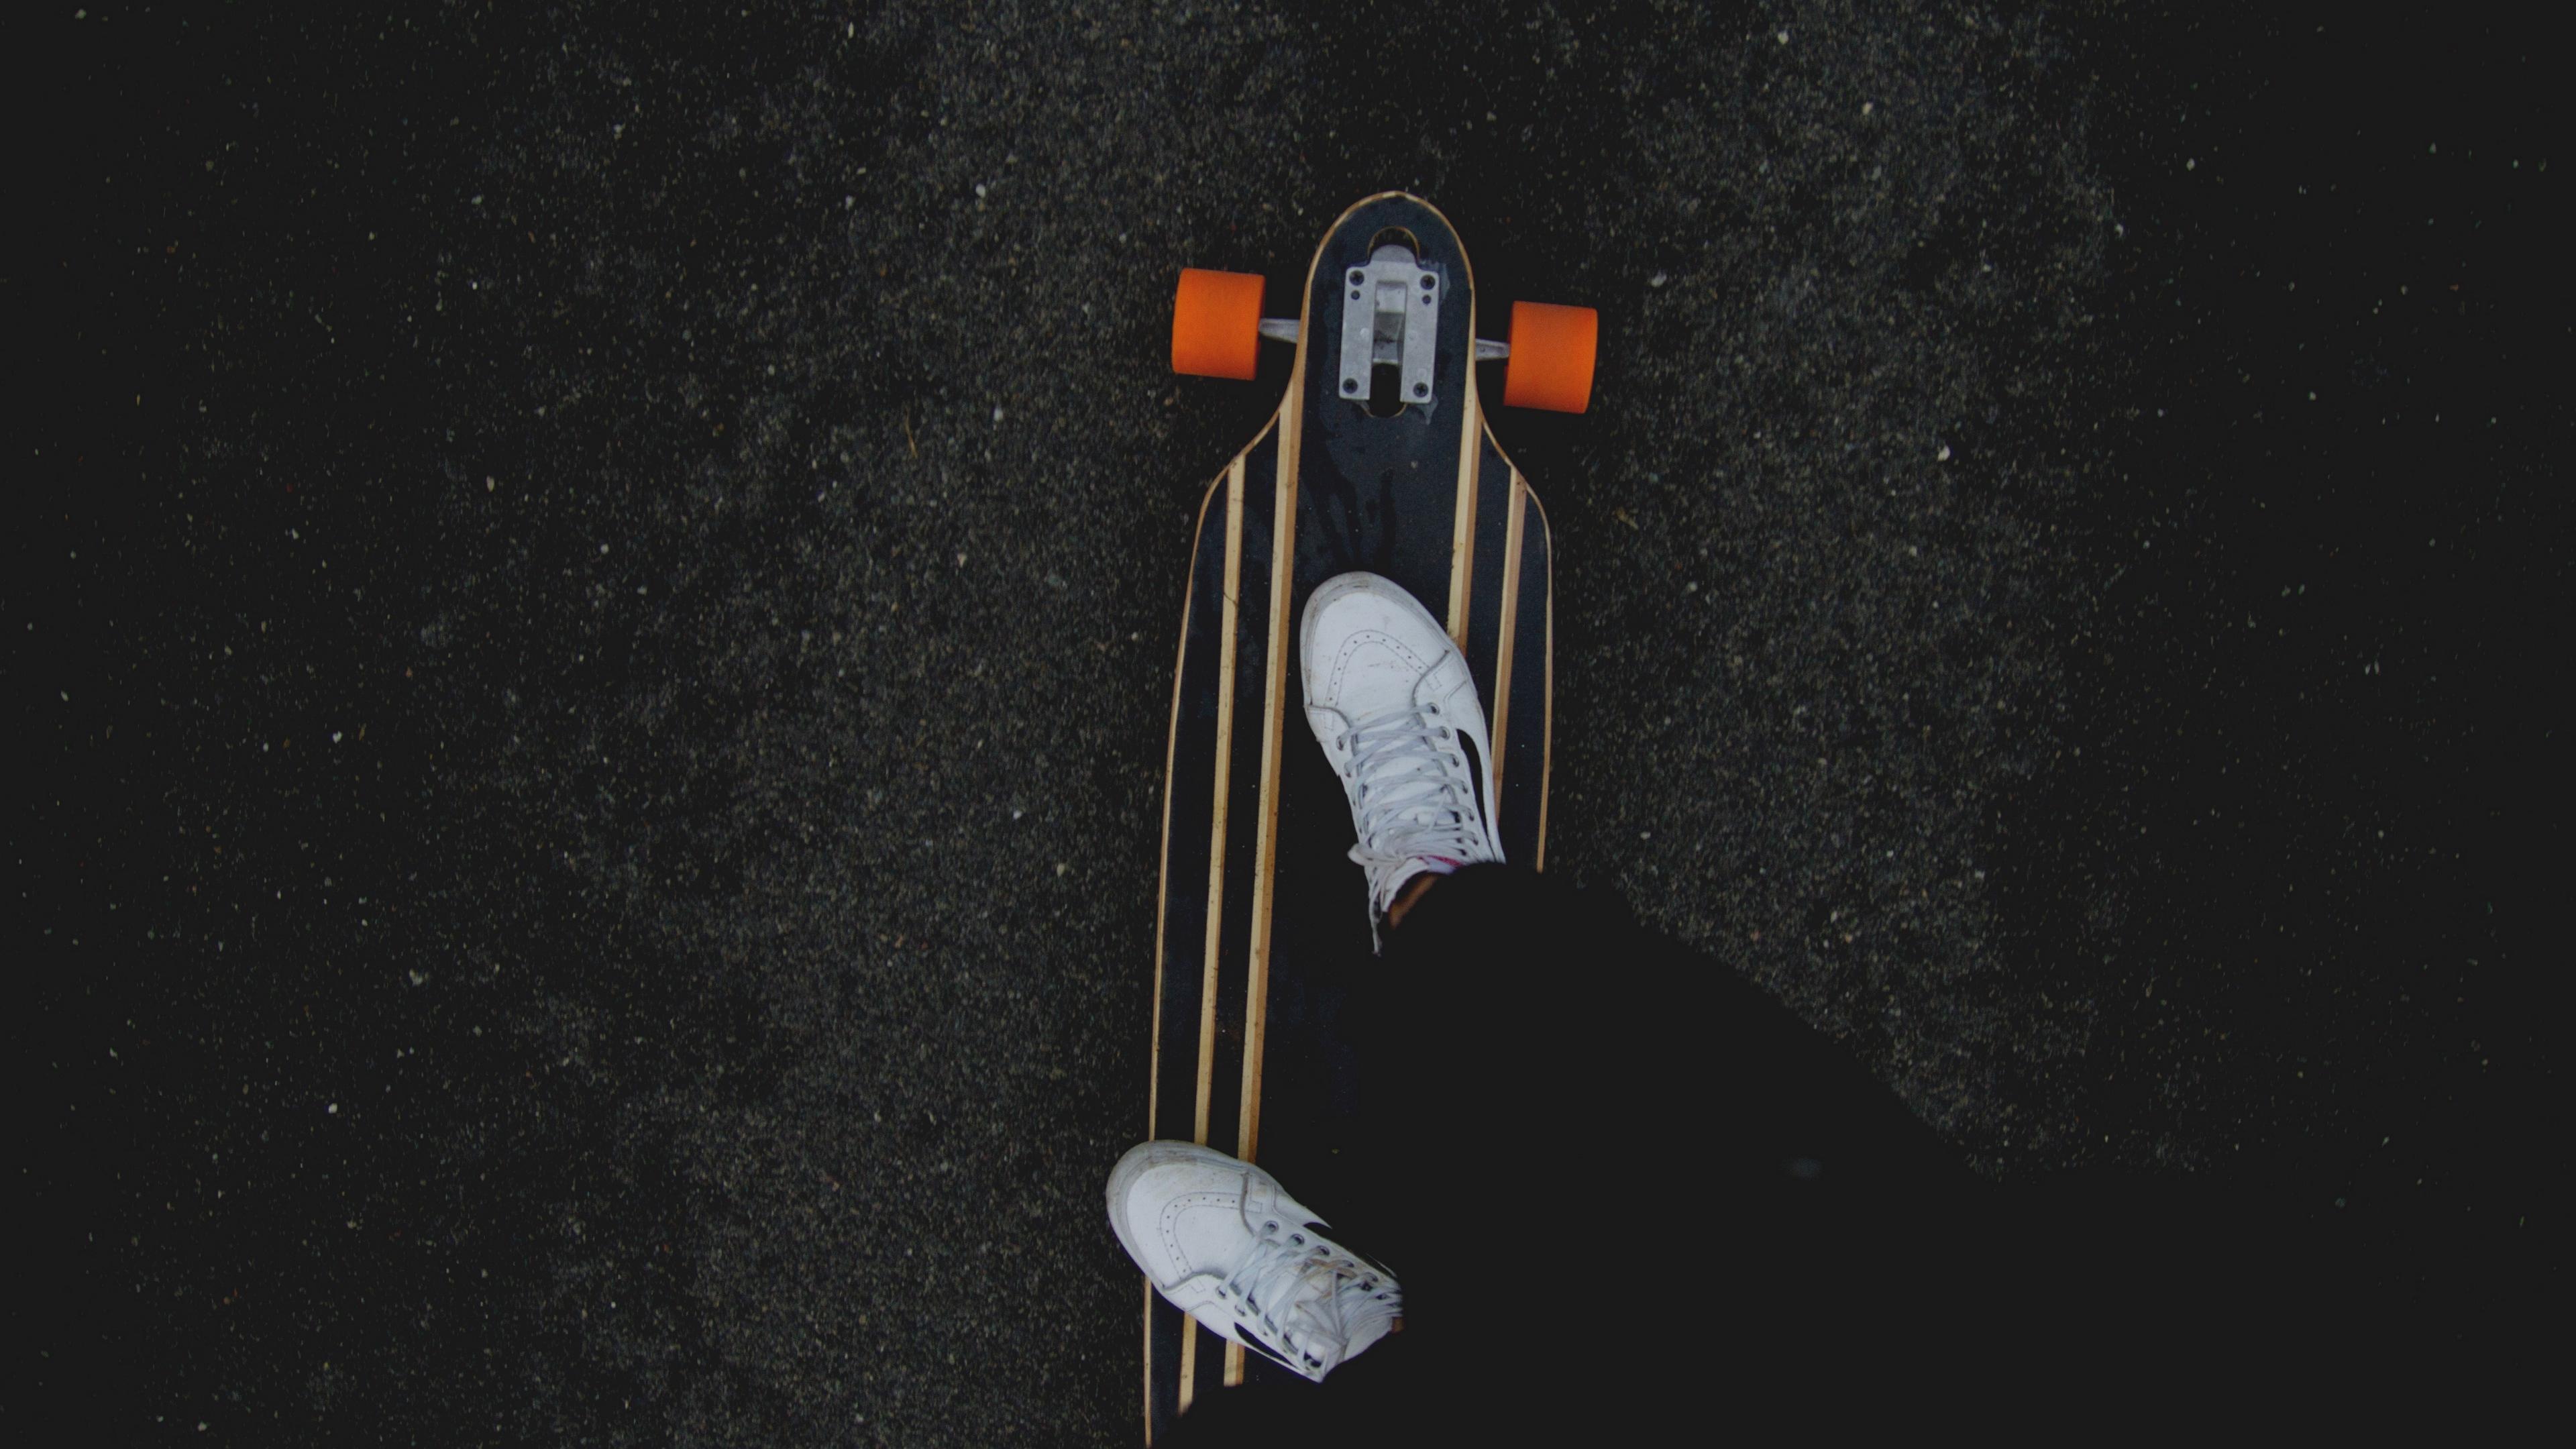 skateboard legs sport 4k 1540061887 - skateboard, legs, sport 4k - Sport, skateboard, legs